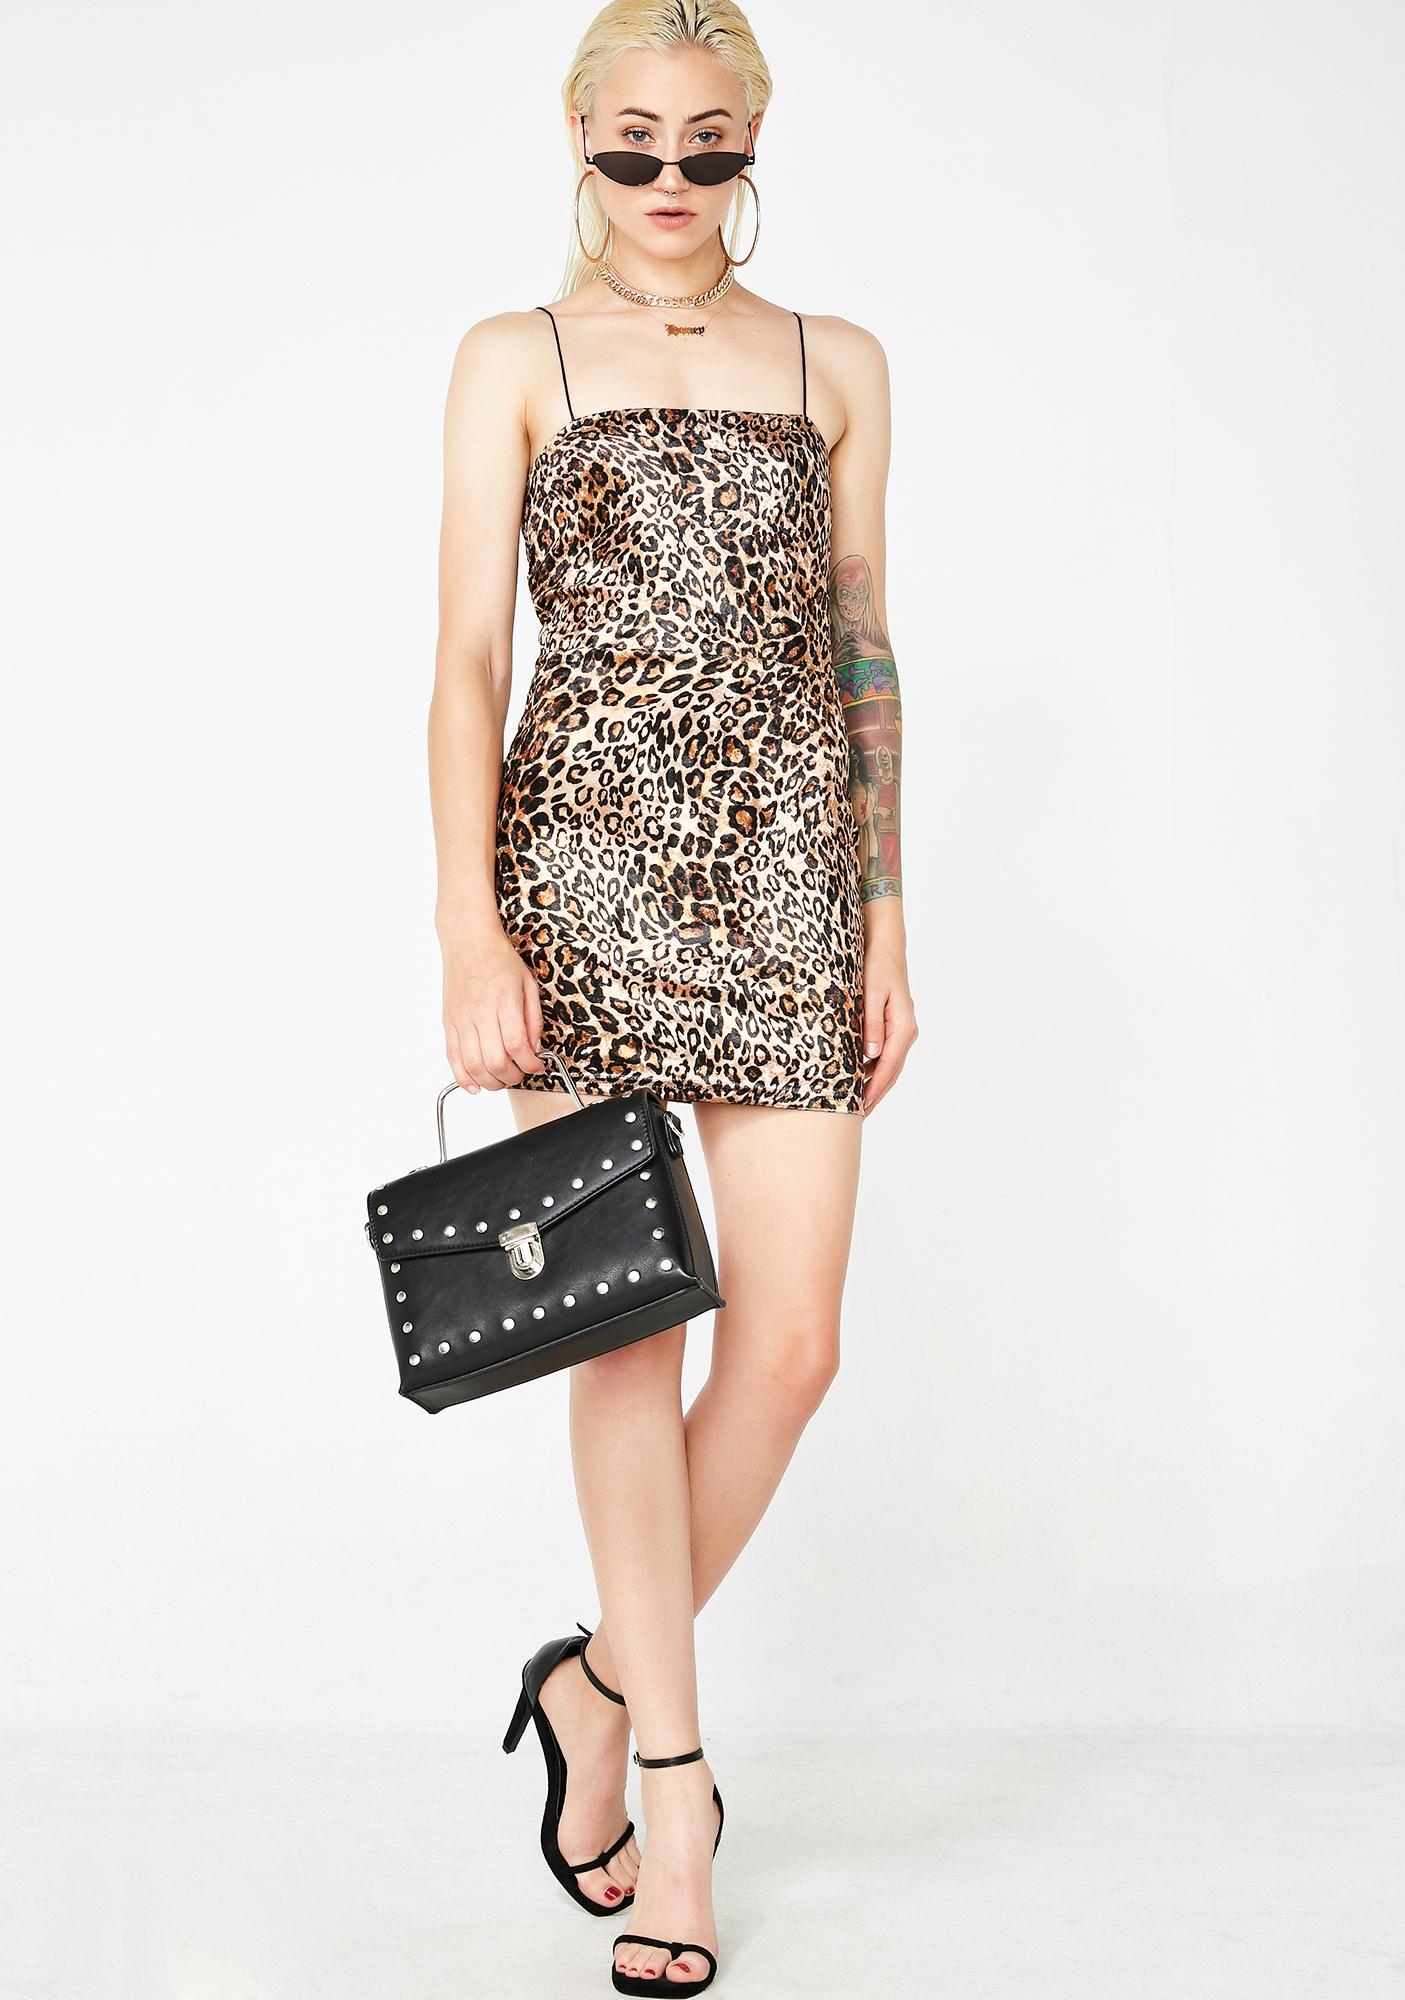 Jagger & Stone The Pammy Dress